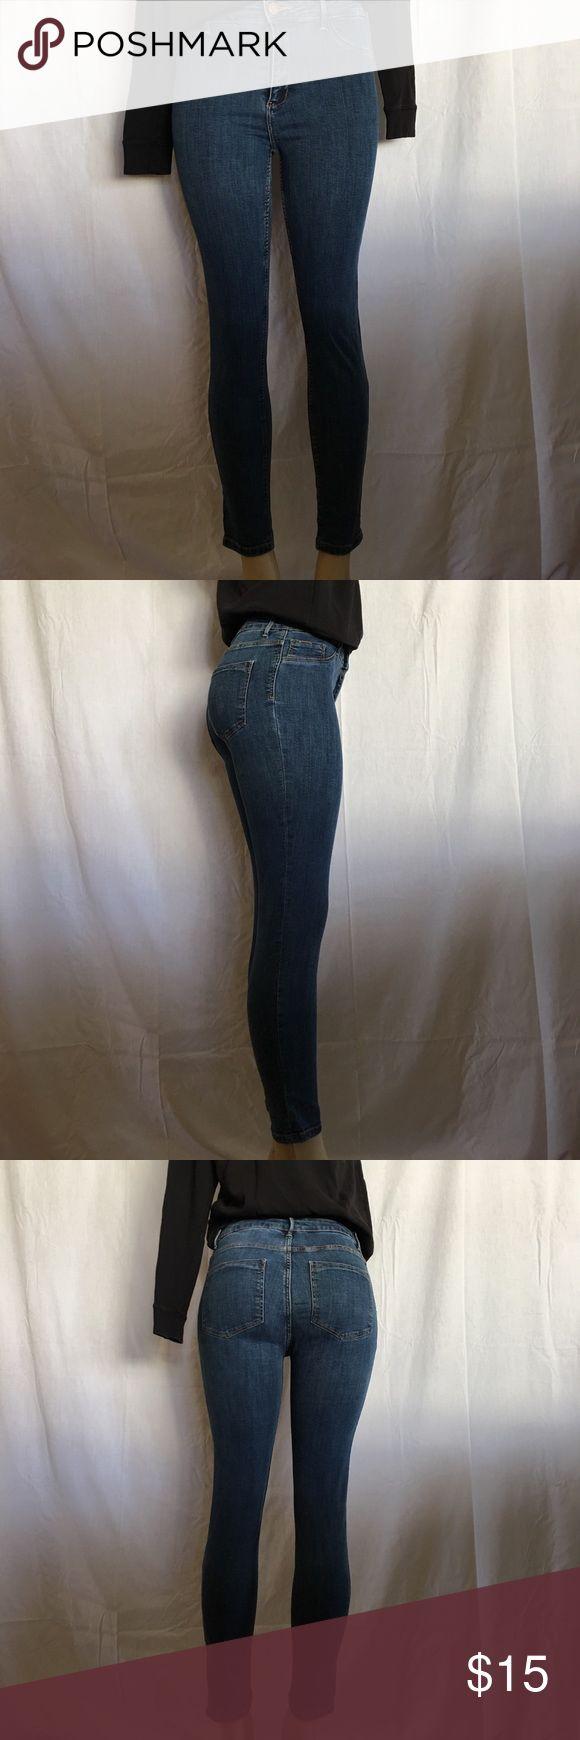 Zara high waist jeggings Basic denim jeggings gently worn in excellent condition. Zara Pants Skinny